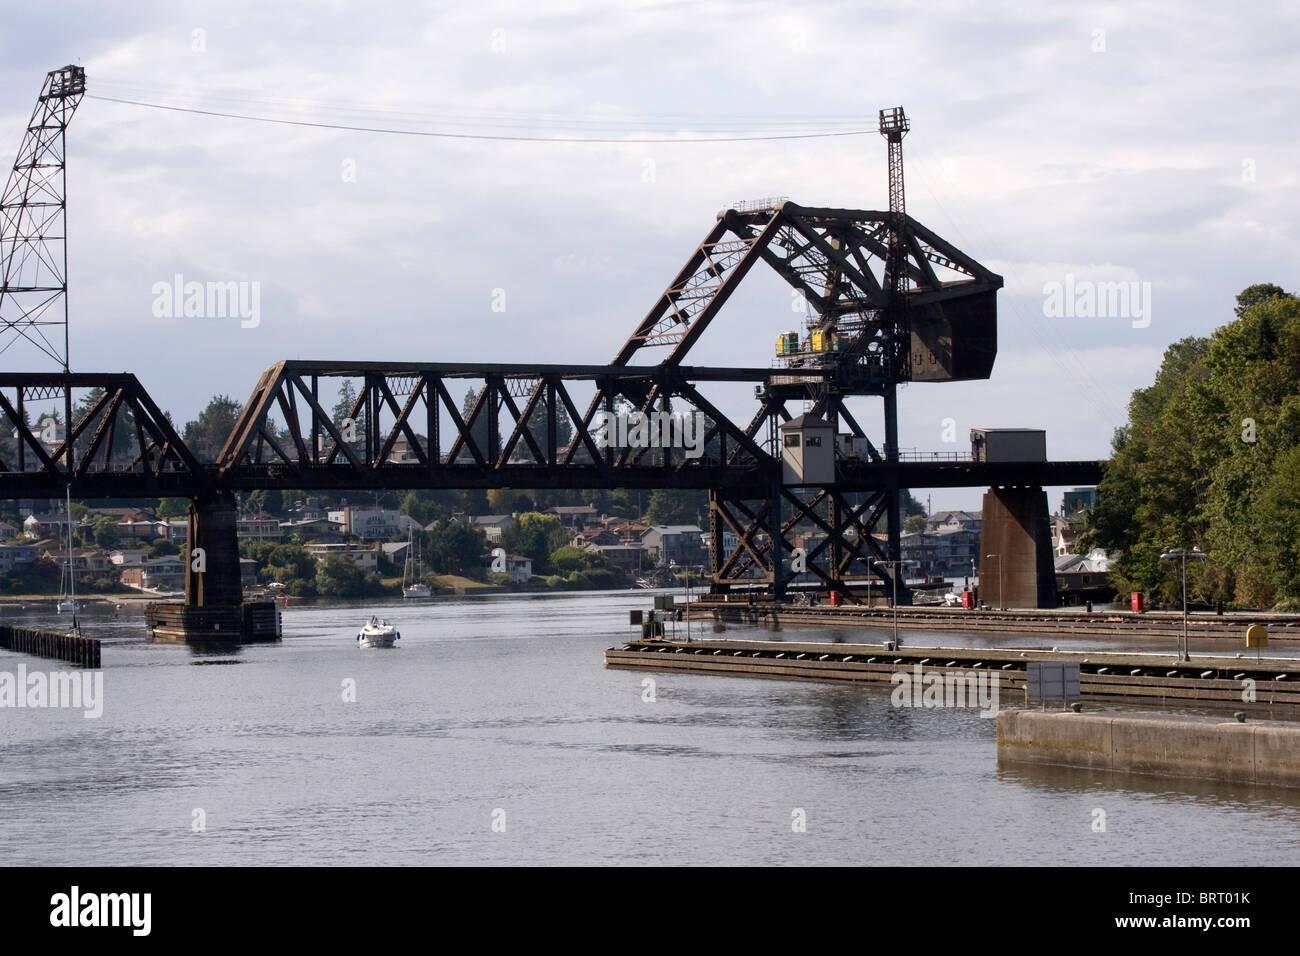 Ballard Bridge Stock Photos & Ballard Bridge Stock Images - Alamy